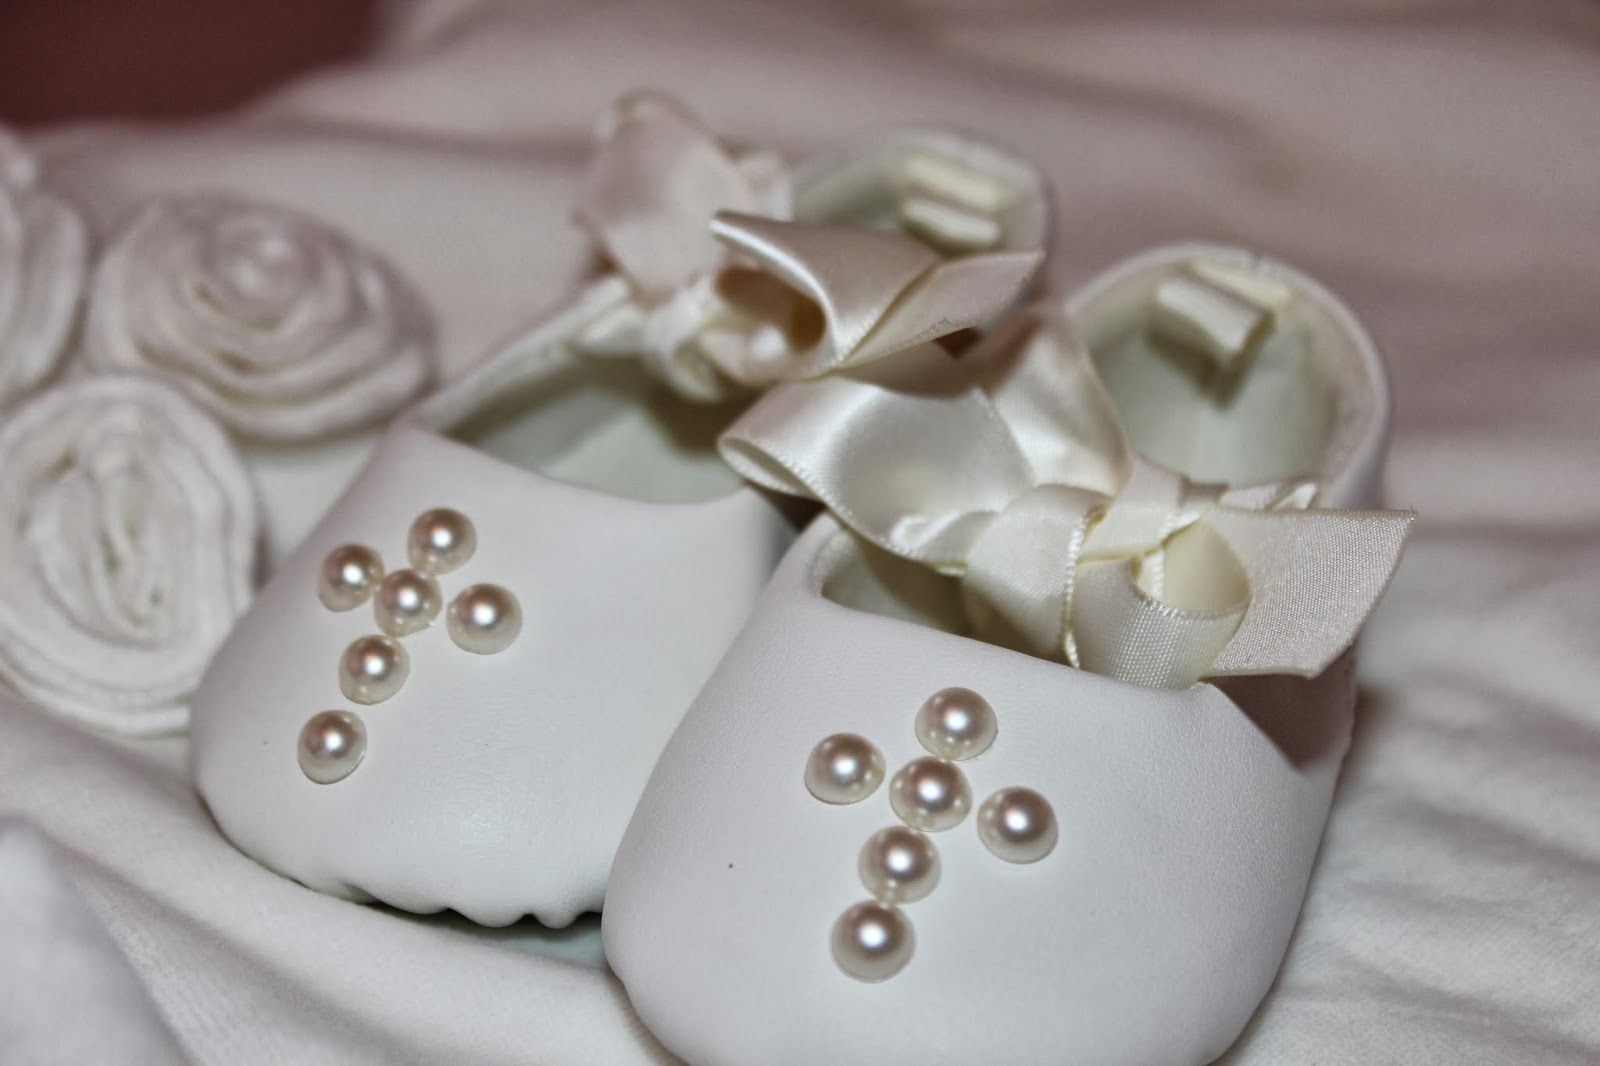 Customized Baby Baptism Slippers  http://sweetonstyleblog.blogspot.com/p/motherhood.html